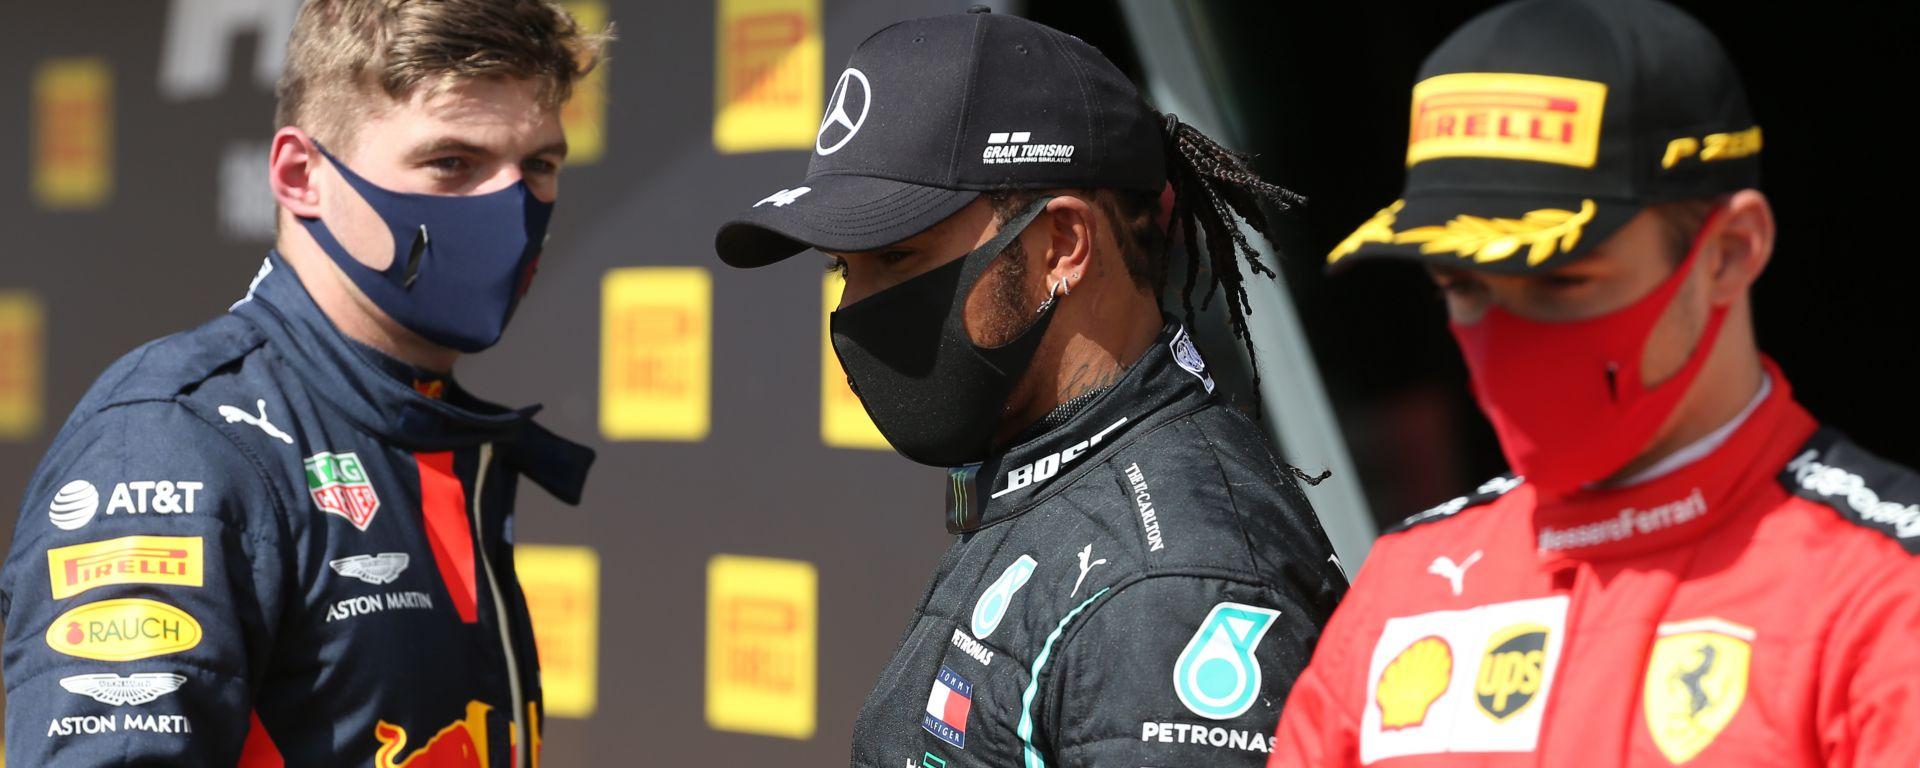 F1, GP Gran Bretagna 2020: Max Verstappen (Red Bull), Lewis Hamilton (Mercedes) e Charles Leclerc (Ferrari)